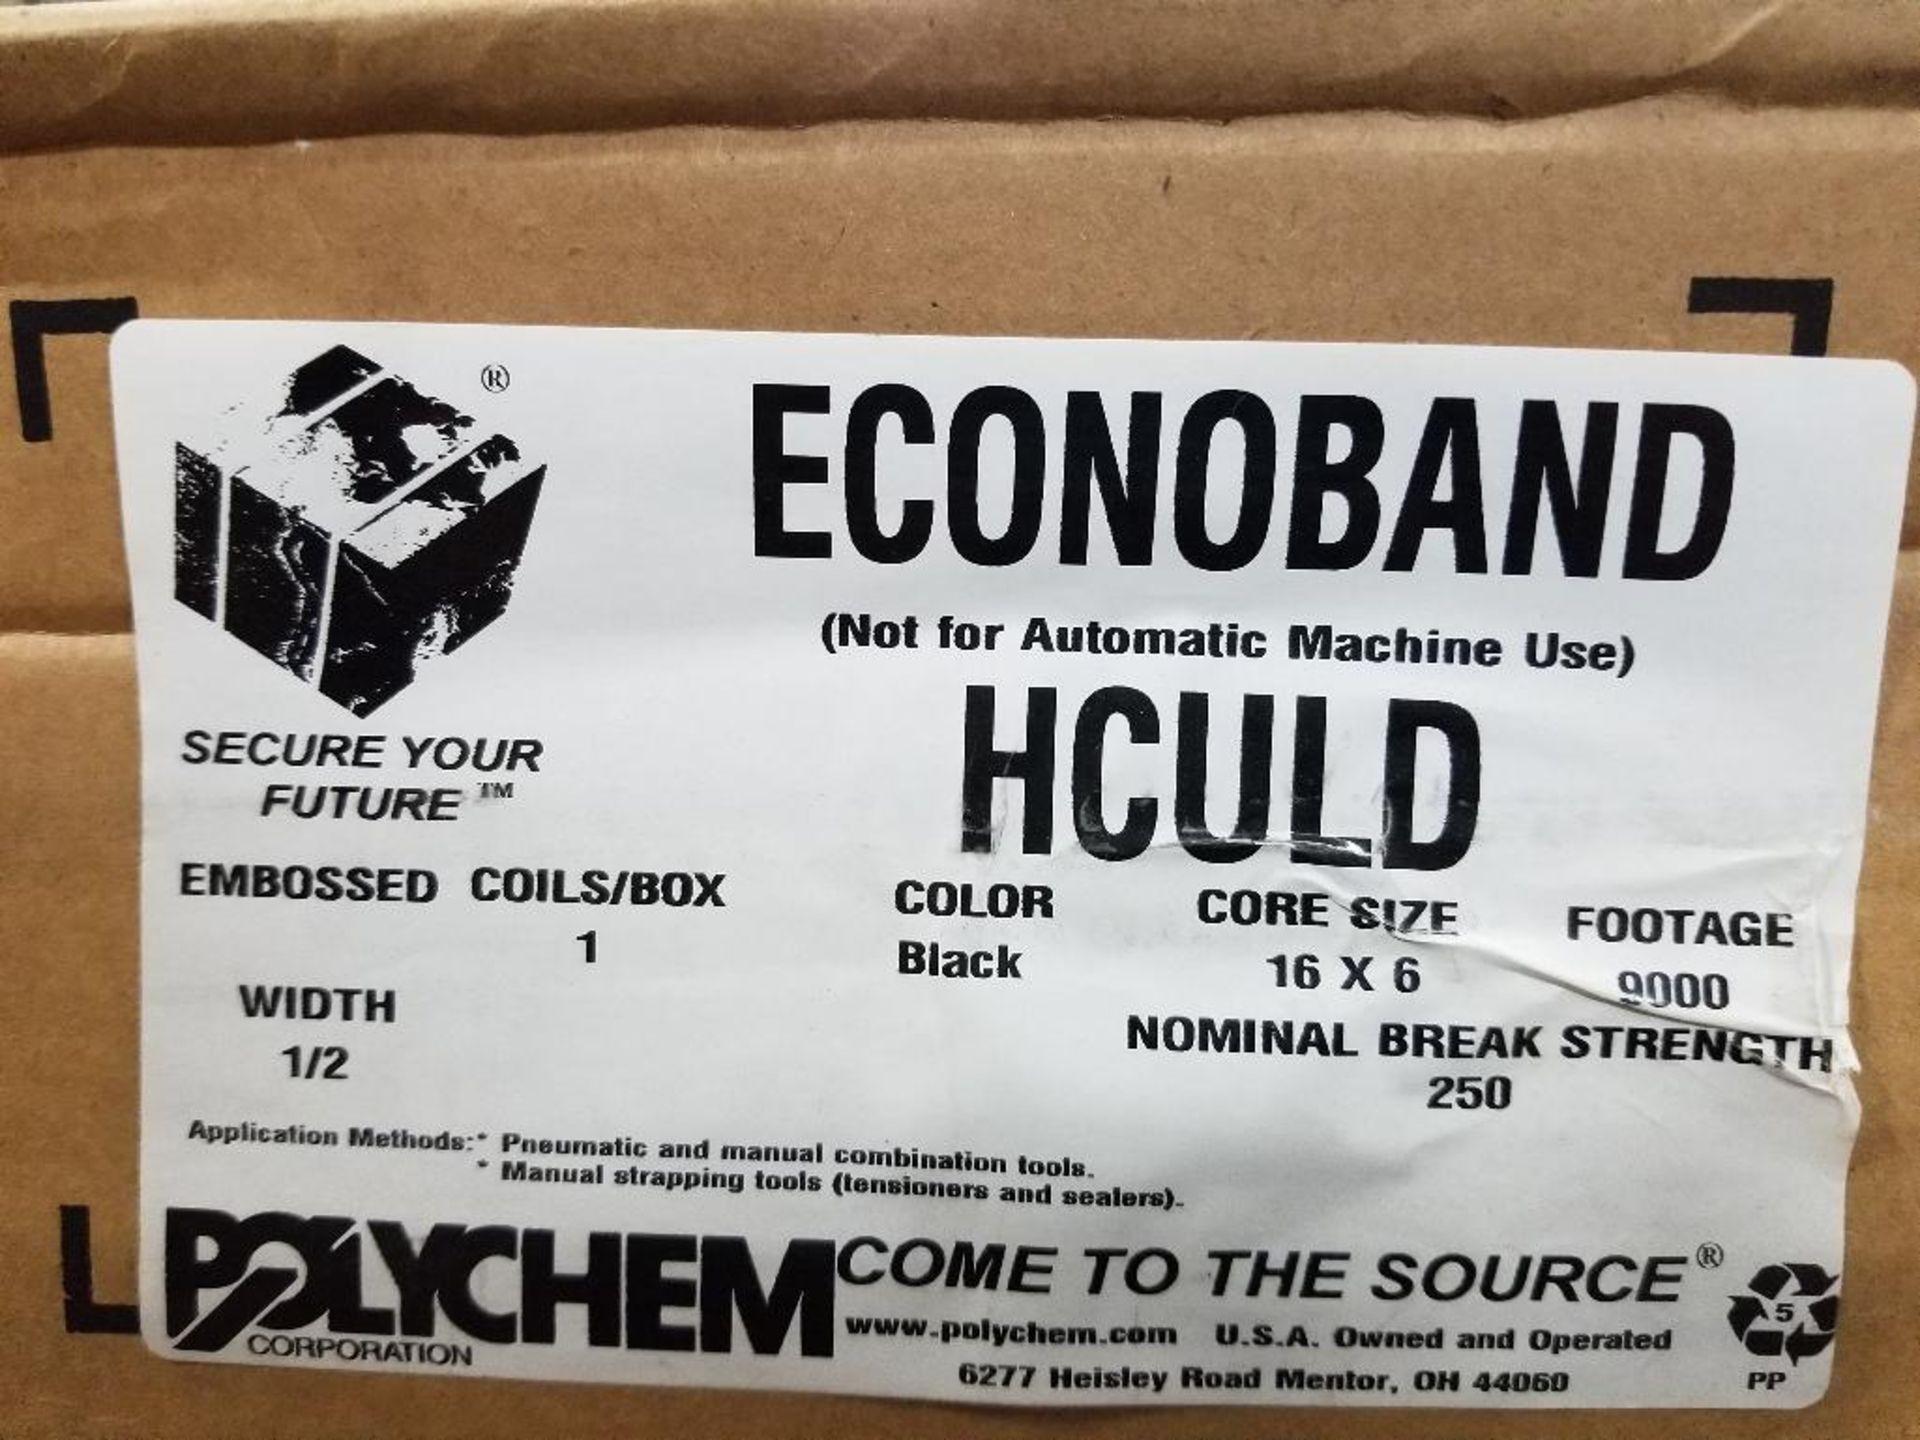 "Qty 4 - Polychem Econoband HCULD 9000Ft black banding. 1/2"". - Image 2 of 2"